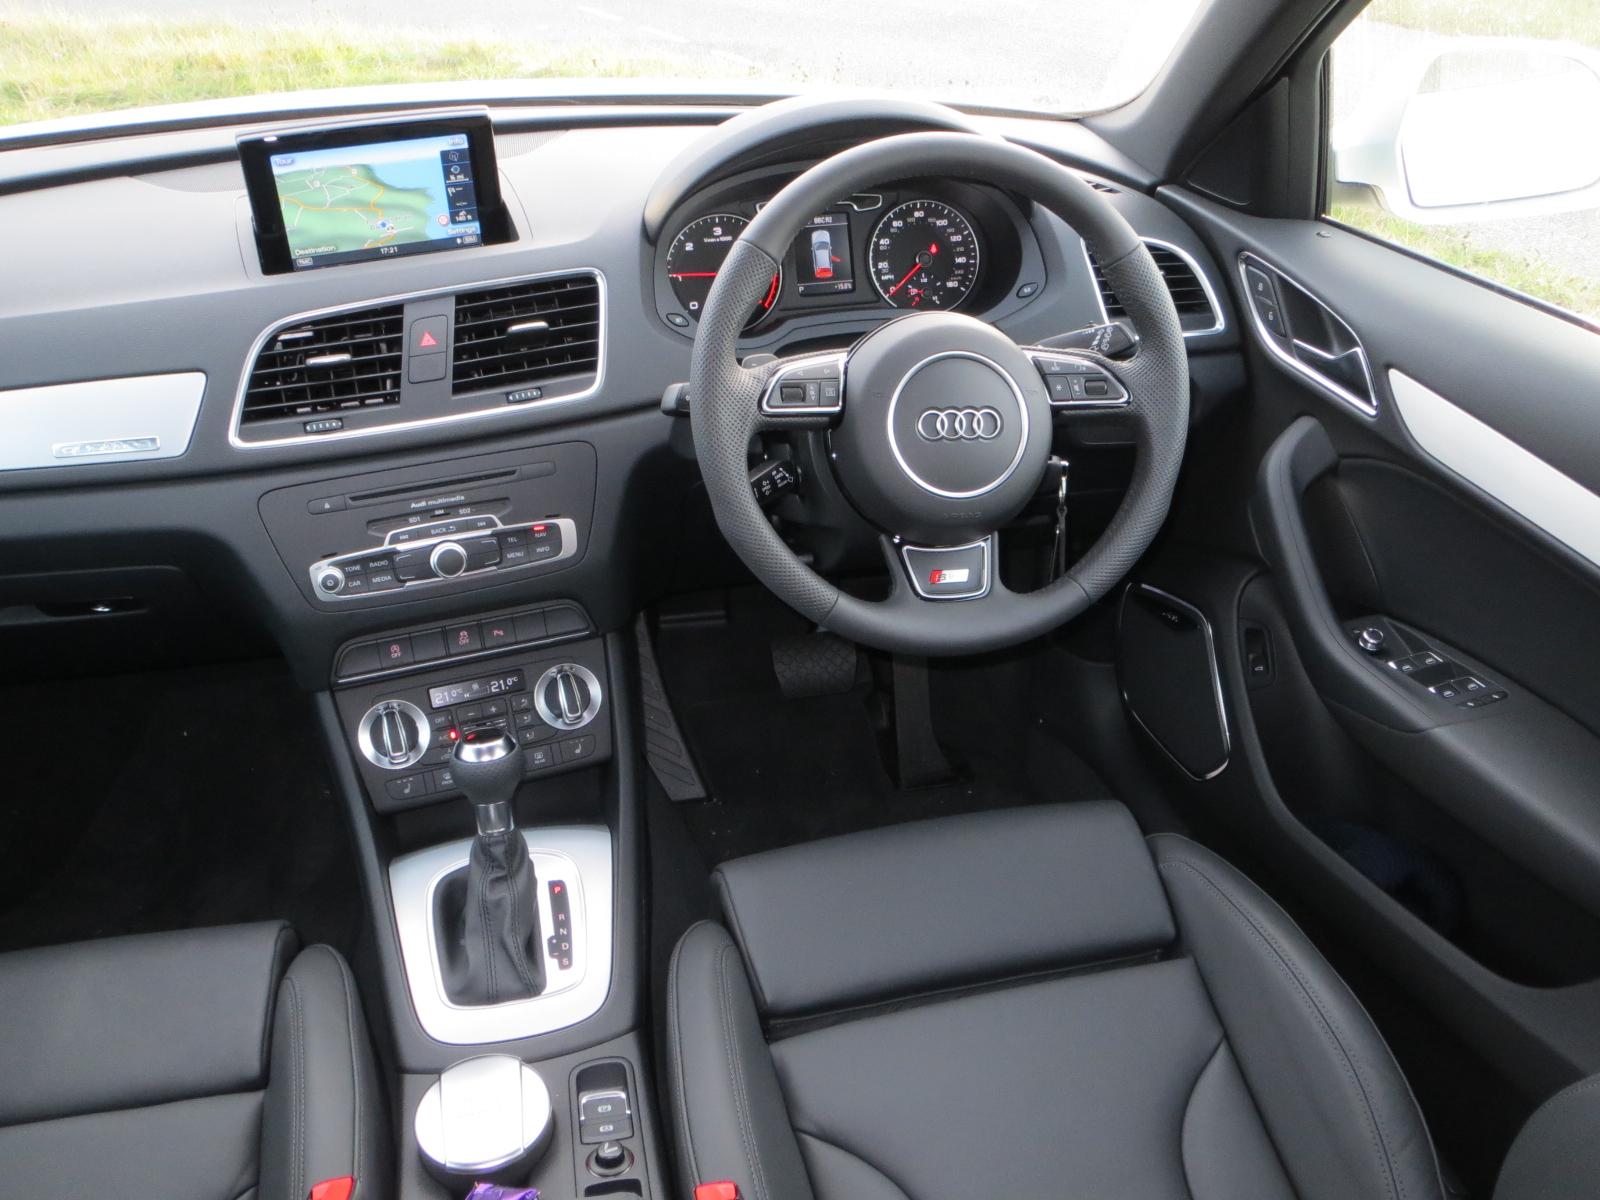 Audi Q3 Tdi Quattro S Line 140 Ps S Tronic Road Test